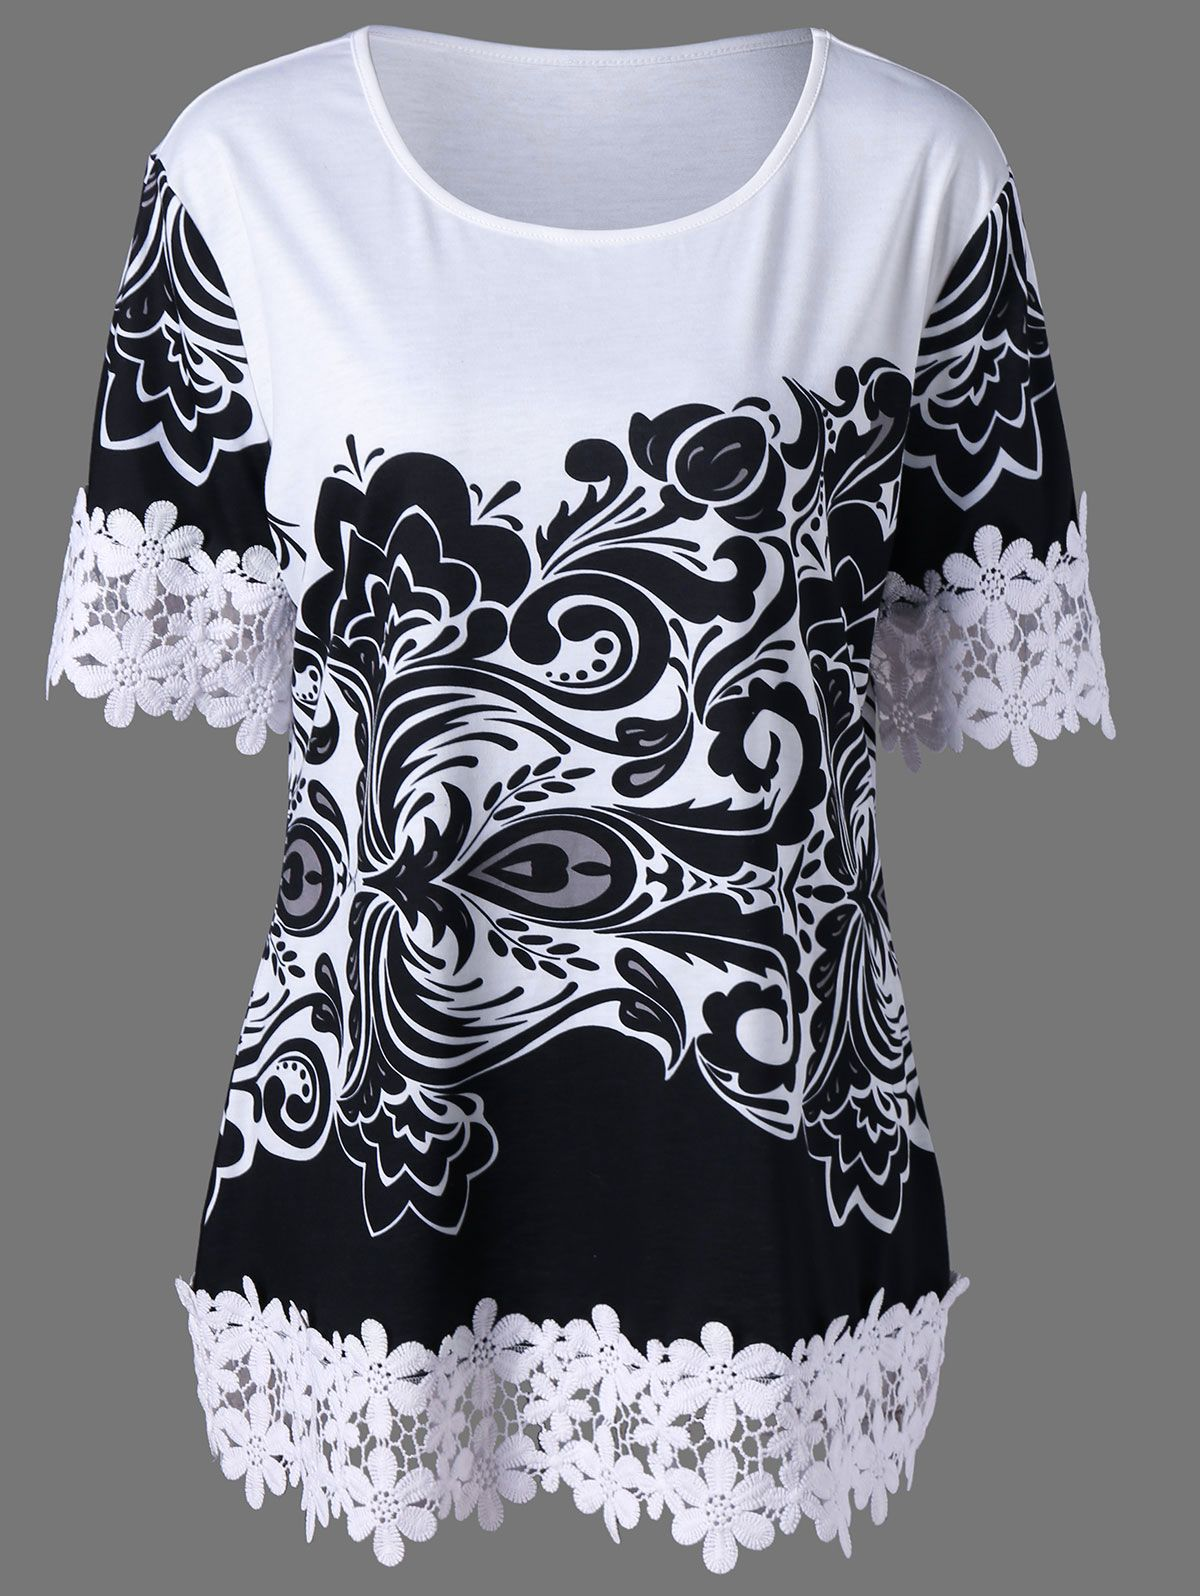 Crochet shirt as an exclusive wardrobe item 53